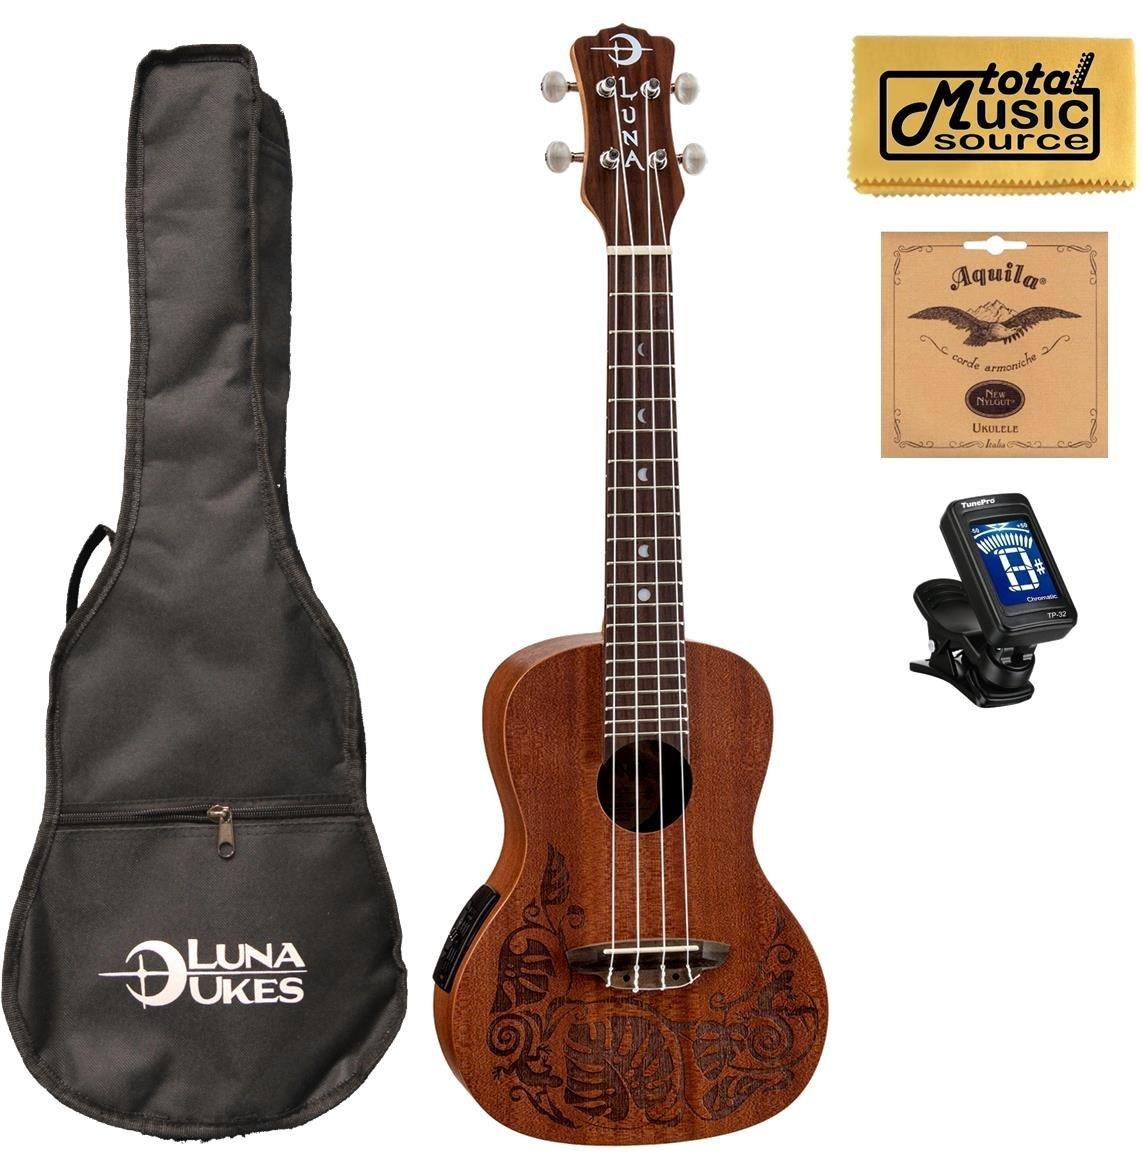 Luna Mahogany Series Mo'o Acoustic-Electric Concert Ukulele w/ Gigbag,Tuner,Strings & PC